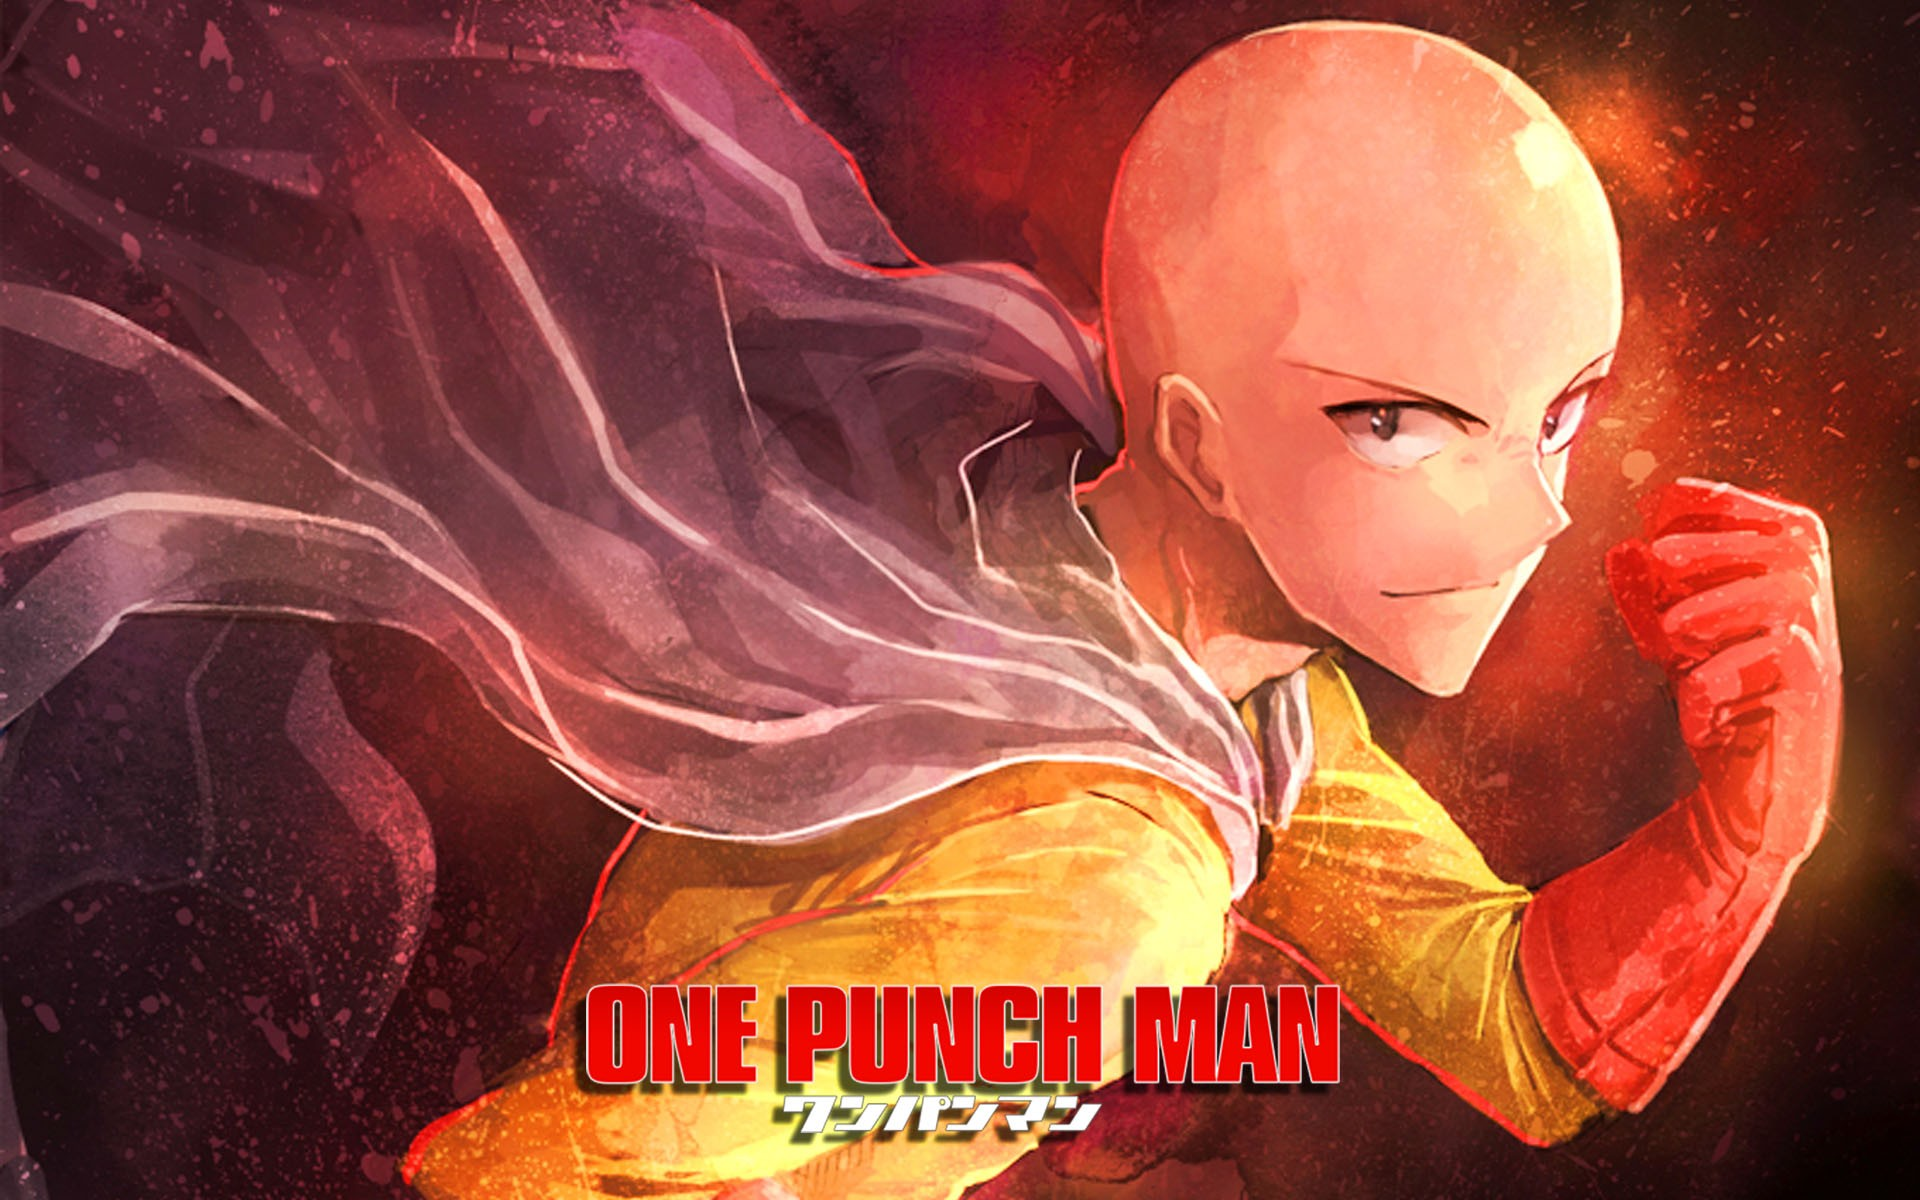 One Punch Man Wallpaper HD ·① Download Free Stunning HD